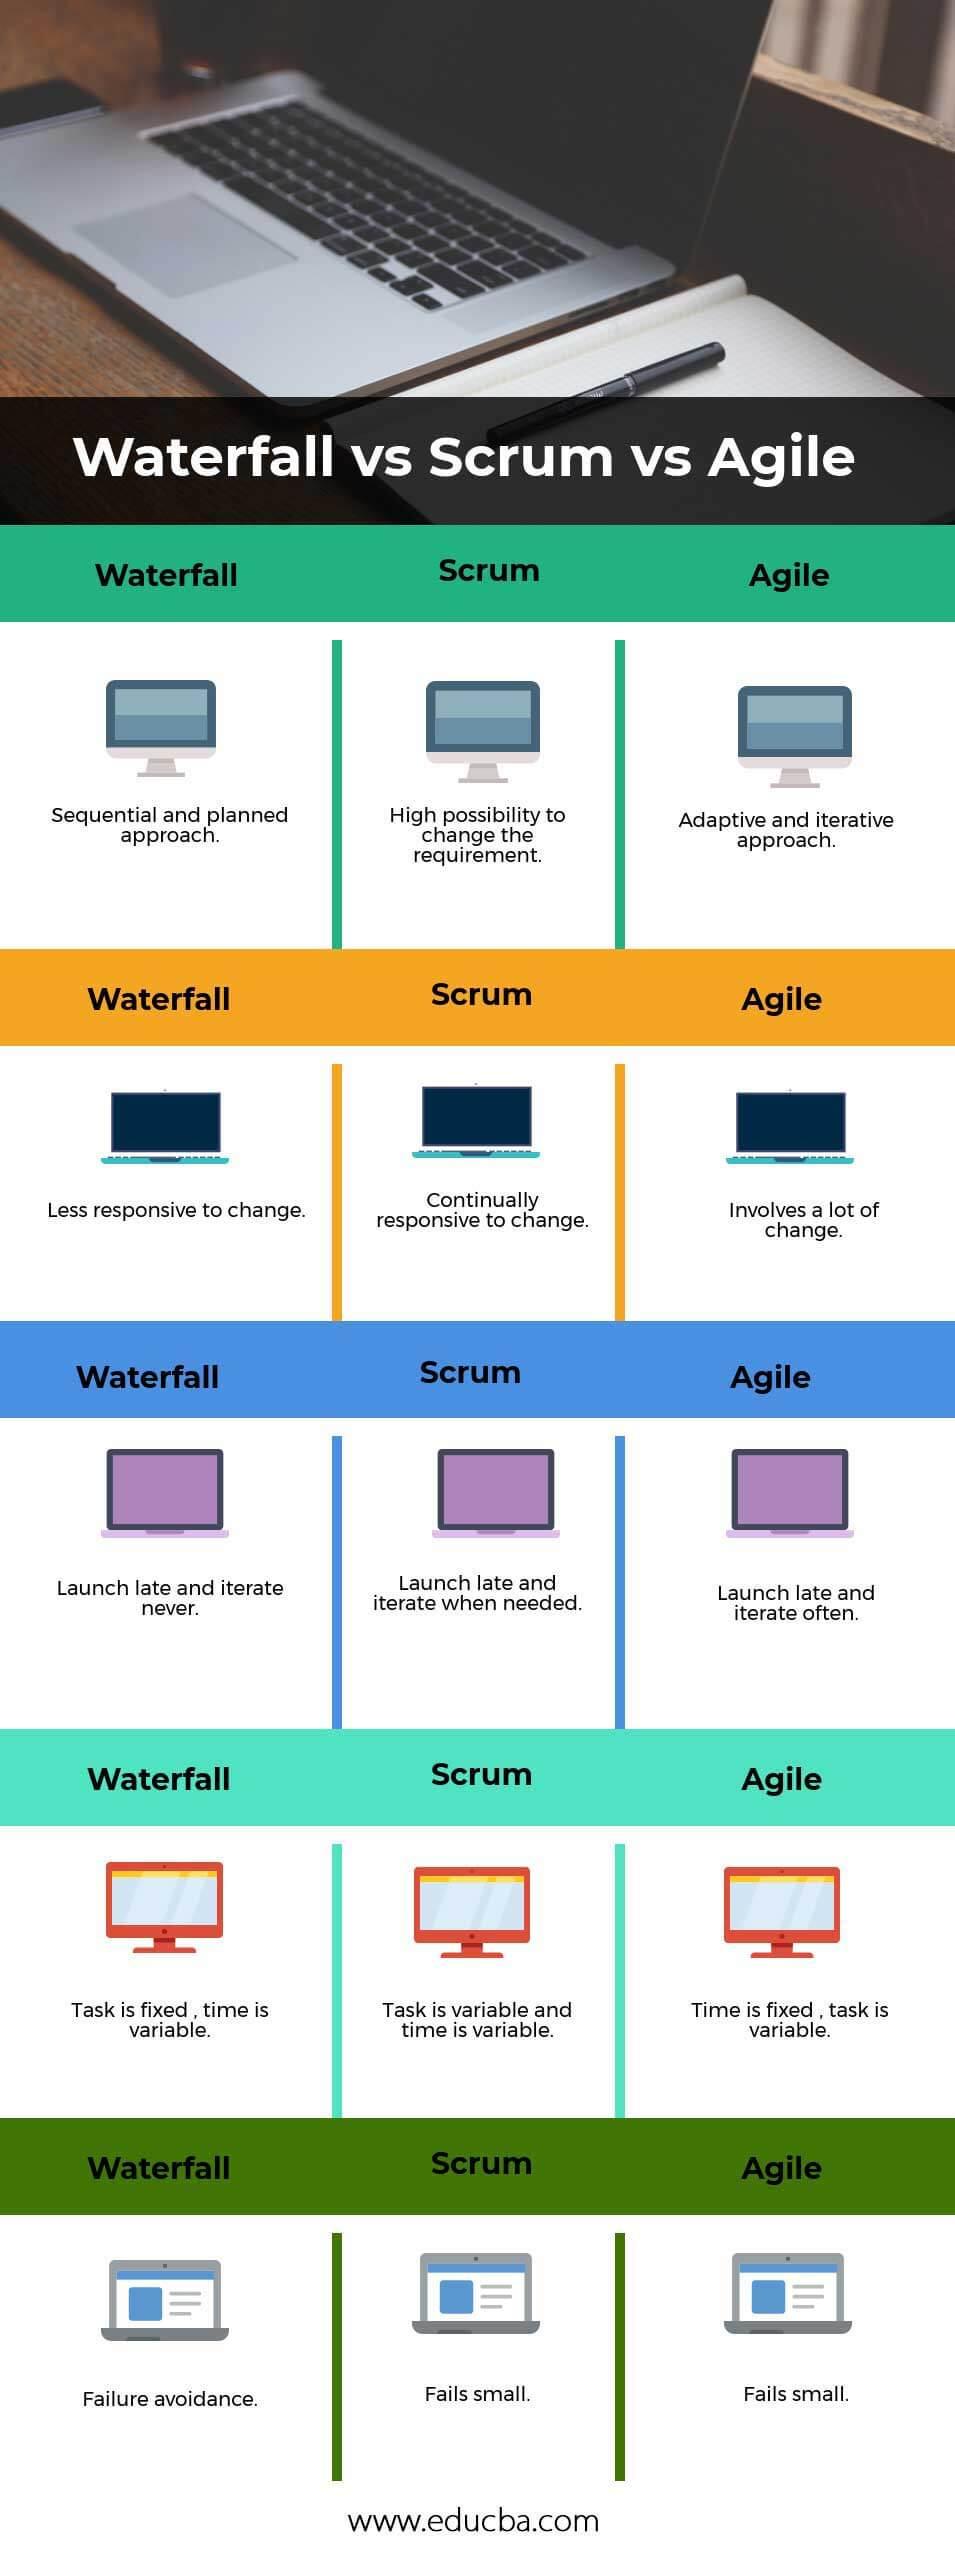 Waterfall-vs-Scrum-vs-Agile info